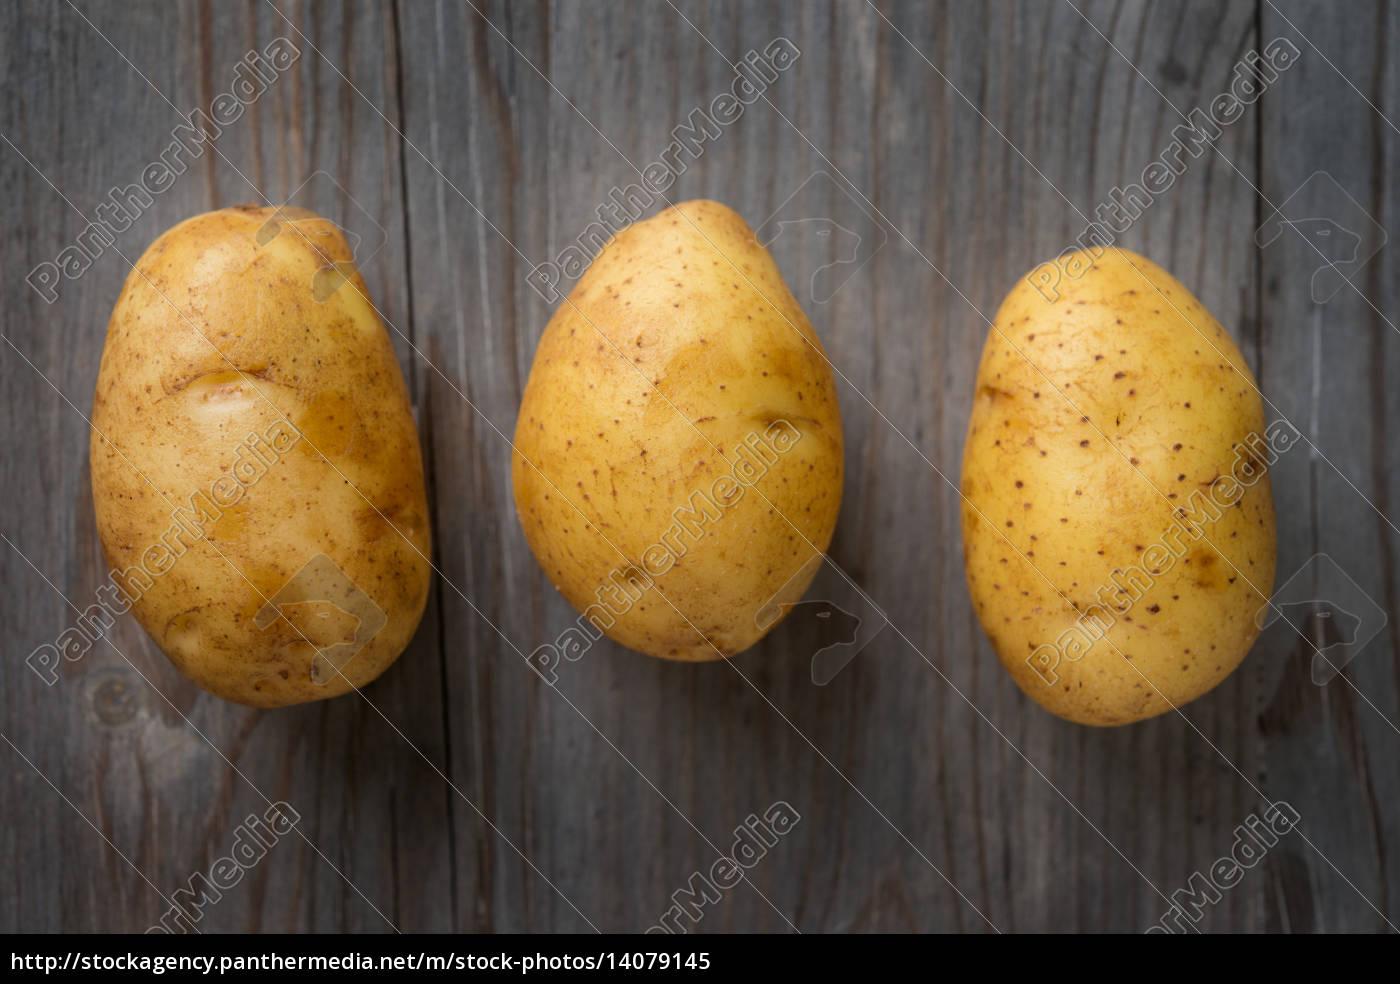 golden, potatoes - 14079145